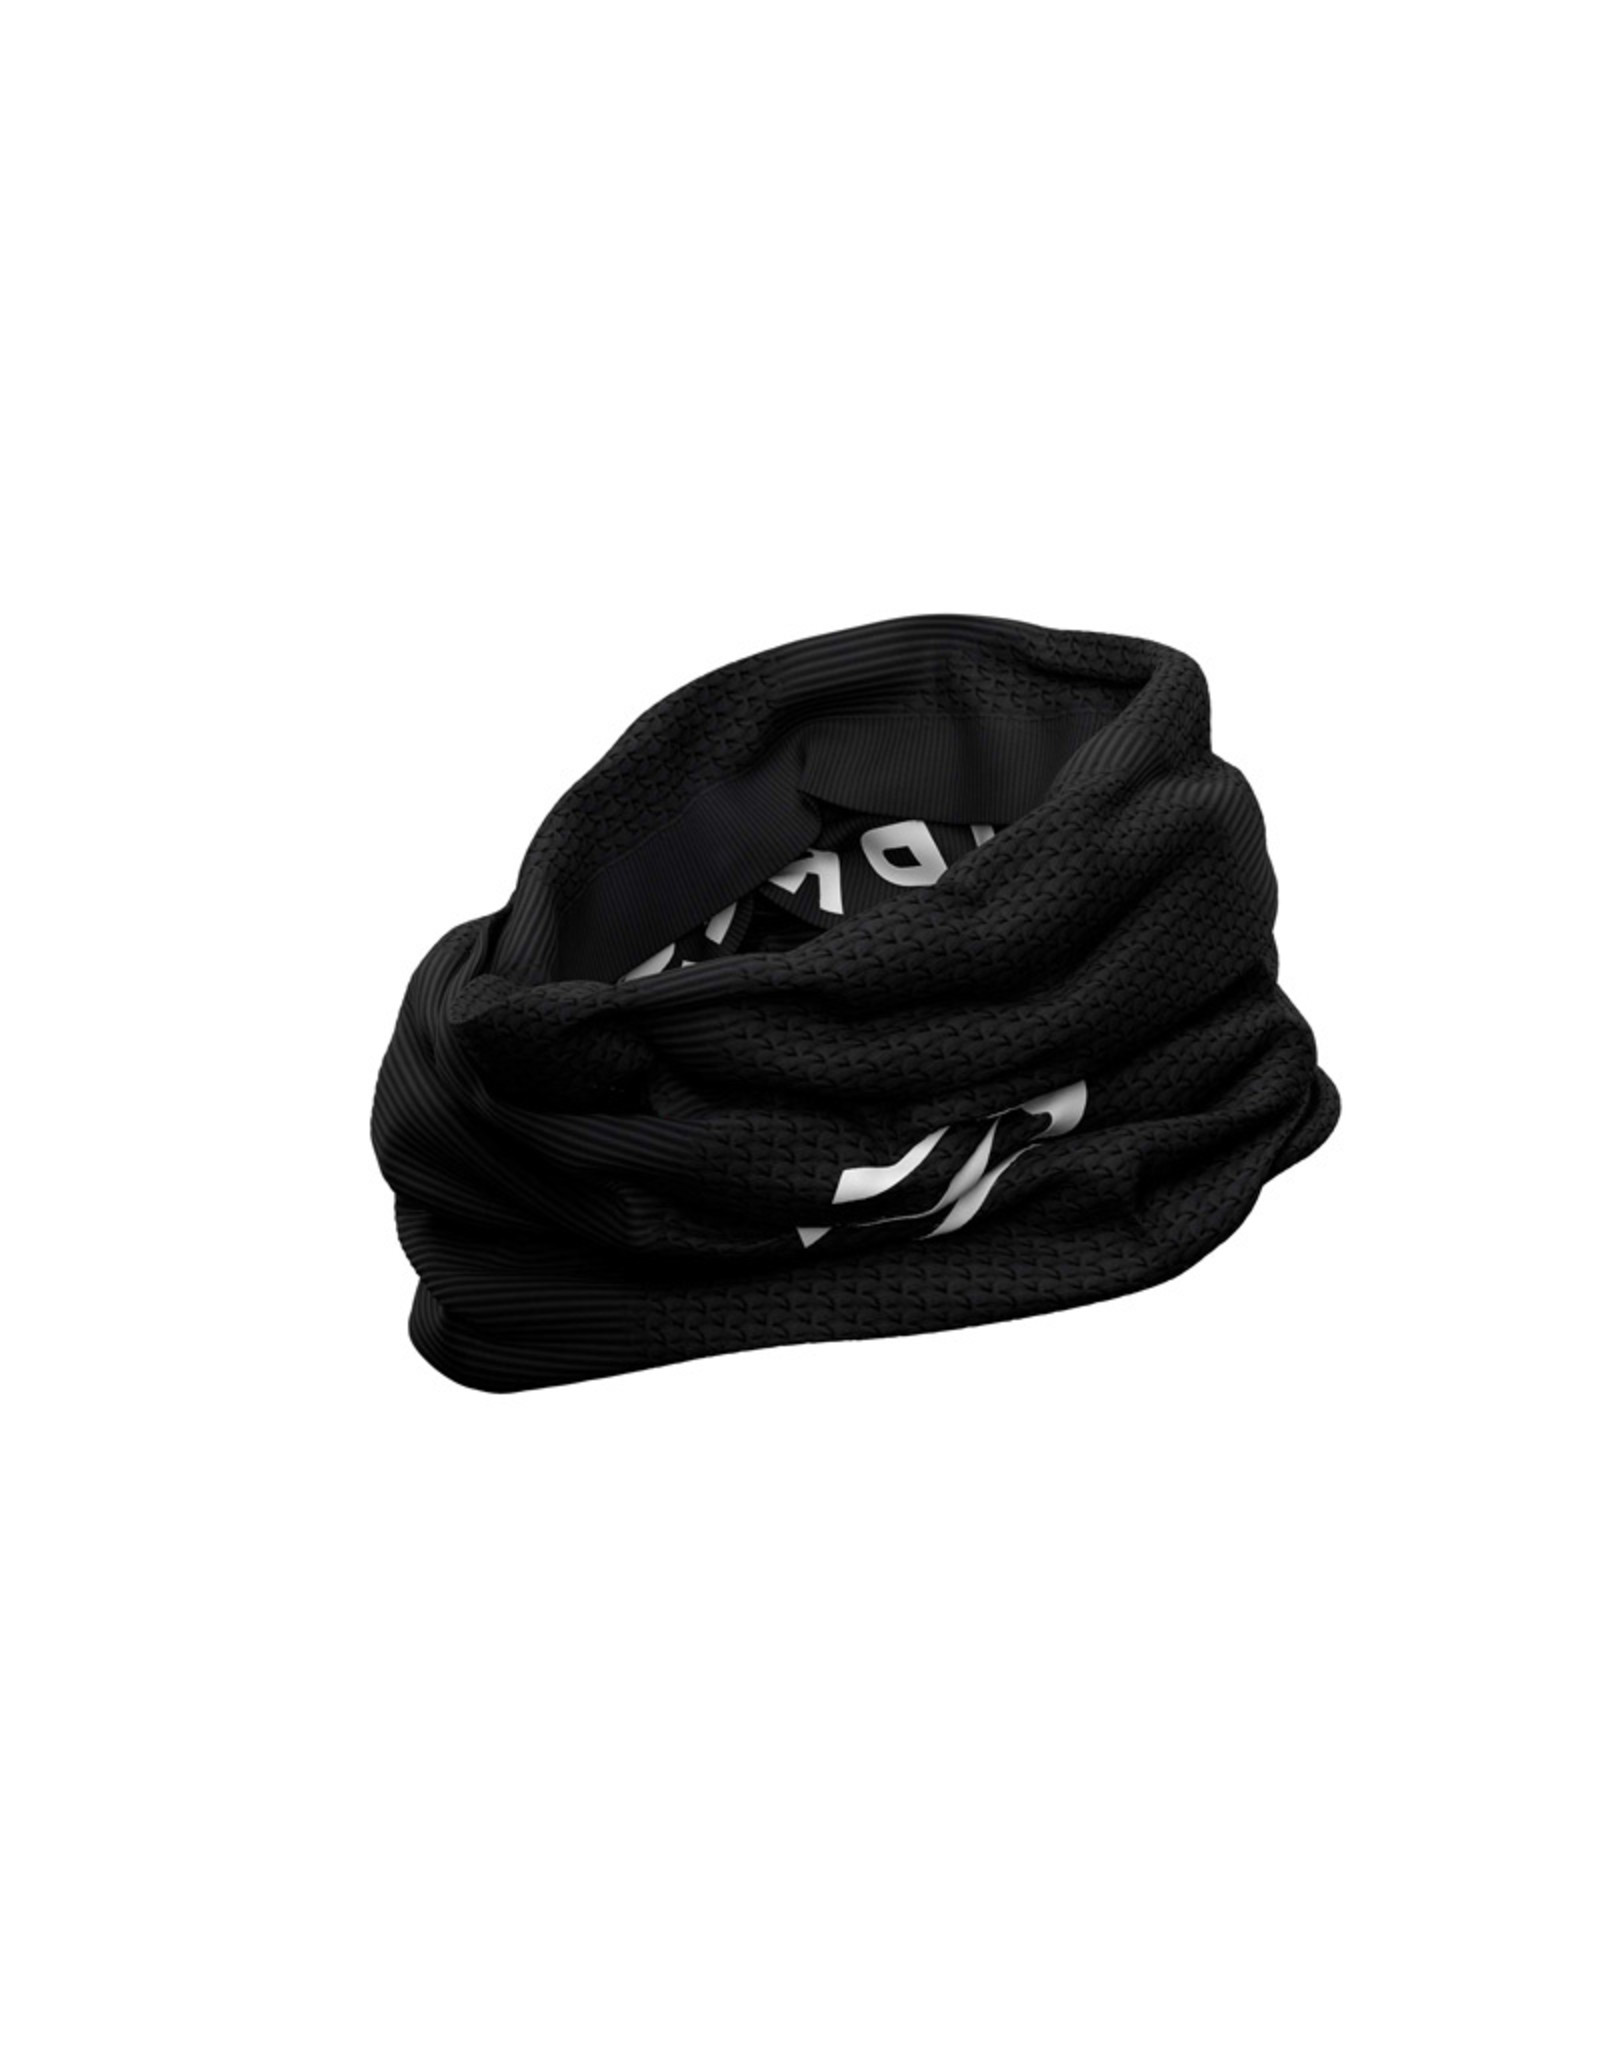 Compressport 3D Thermo Ultralight Headtube - Noir